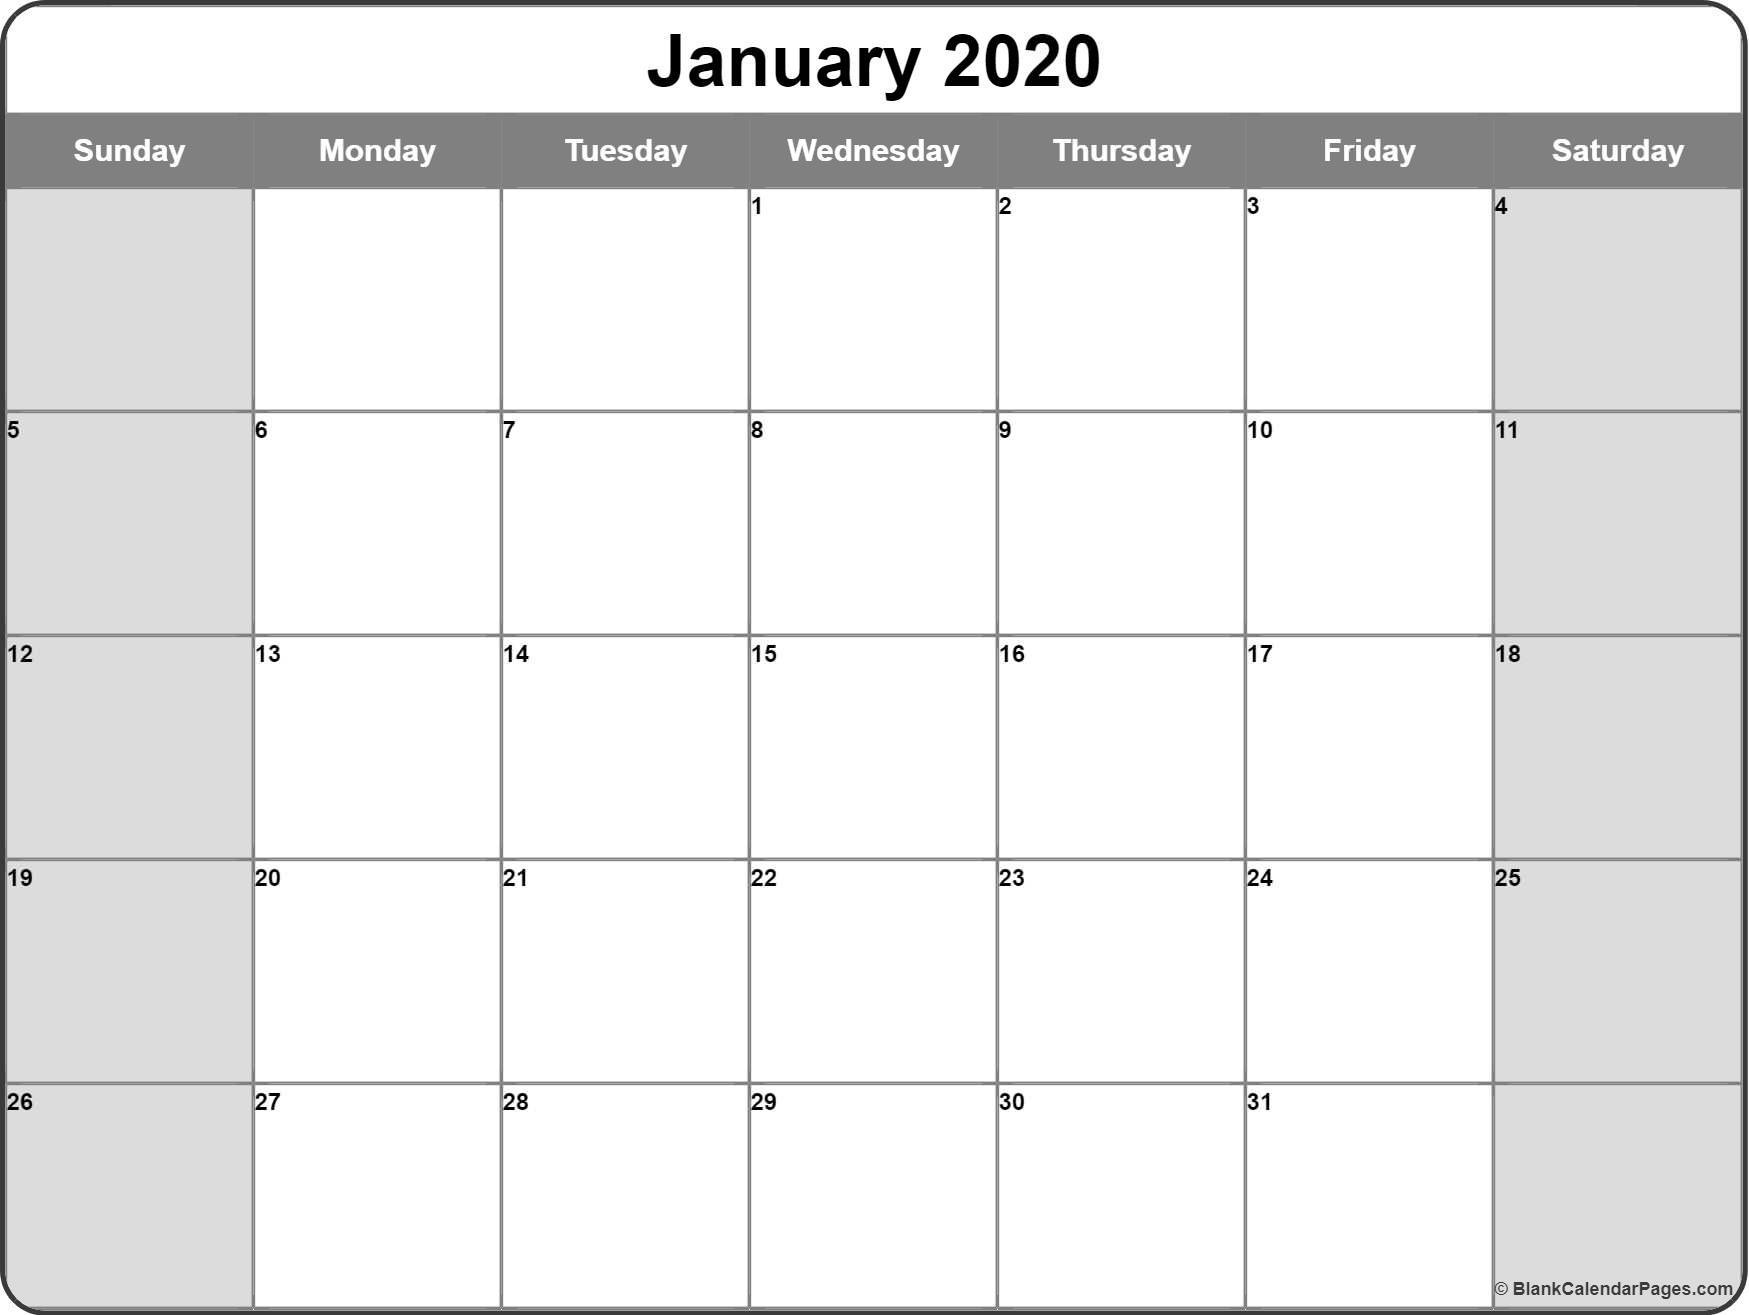 January 2020 Calendar | Free Printable Monthly Calendars with Imom 2020 Calendar